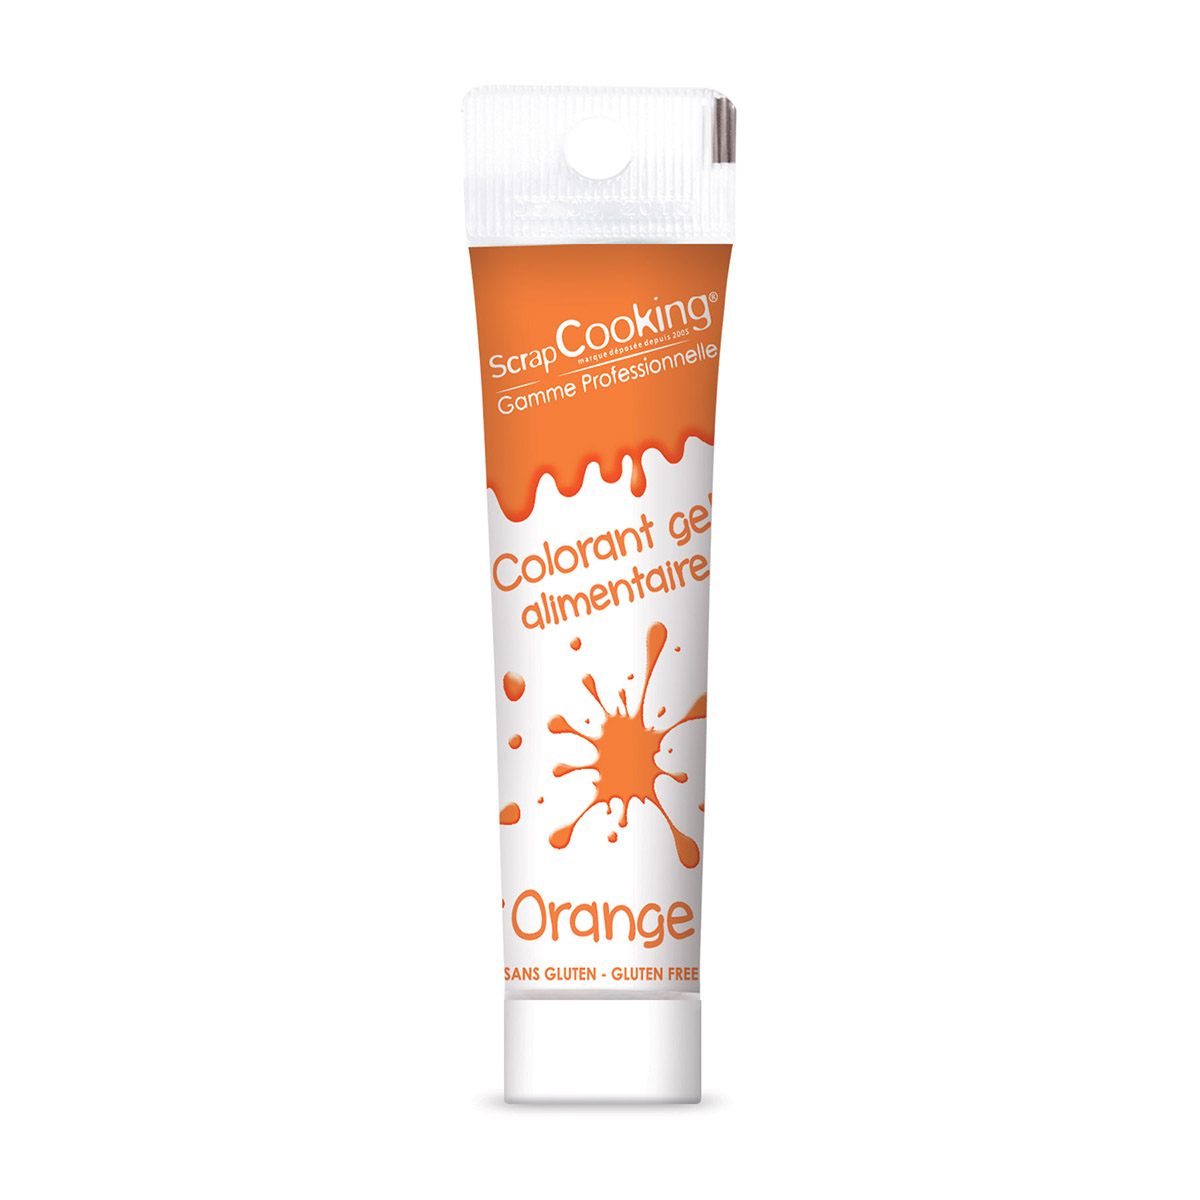 Image du produit Colorant gel orange 20g - Scrapcooking